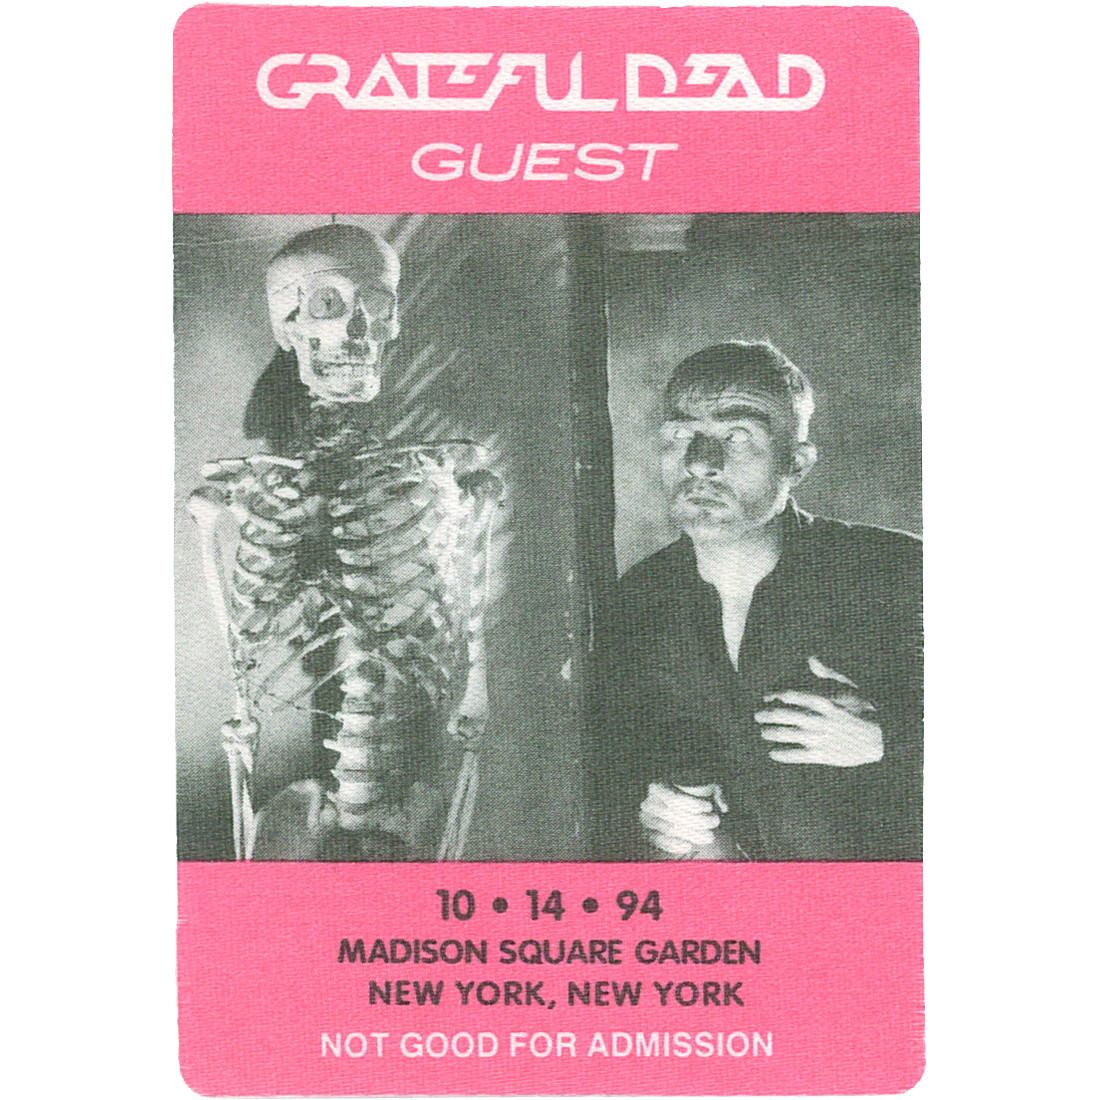 Grateful Dead 1994 10-14 Backstage Pass